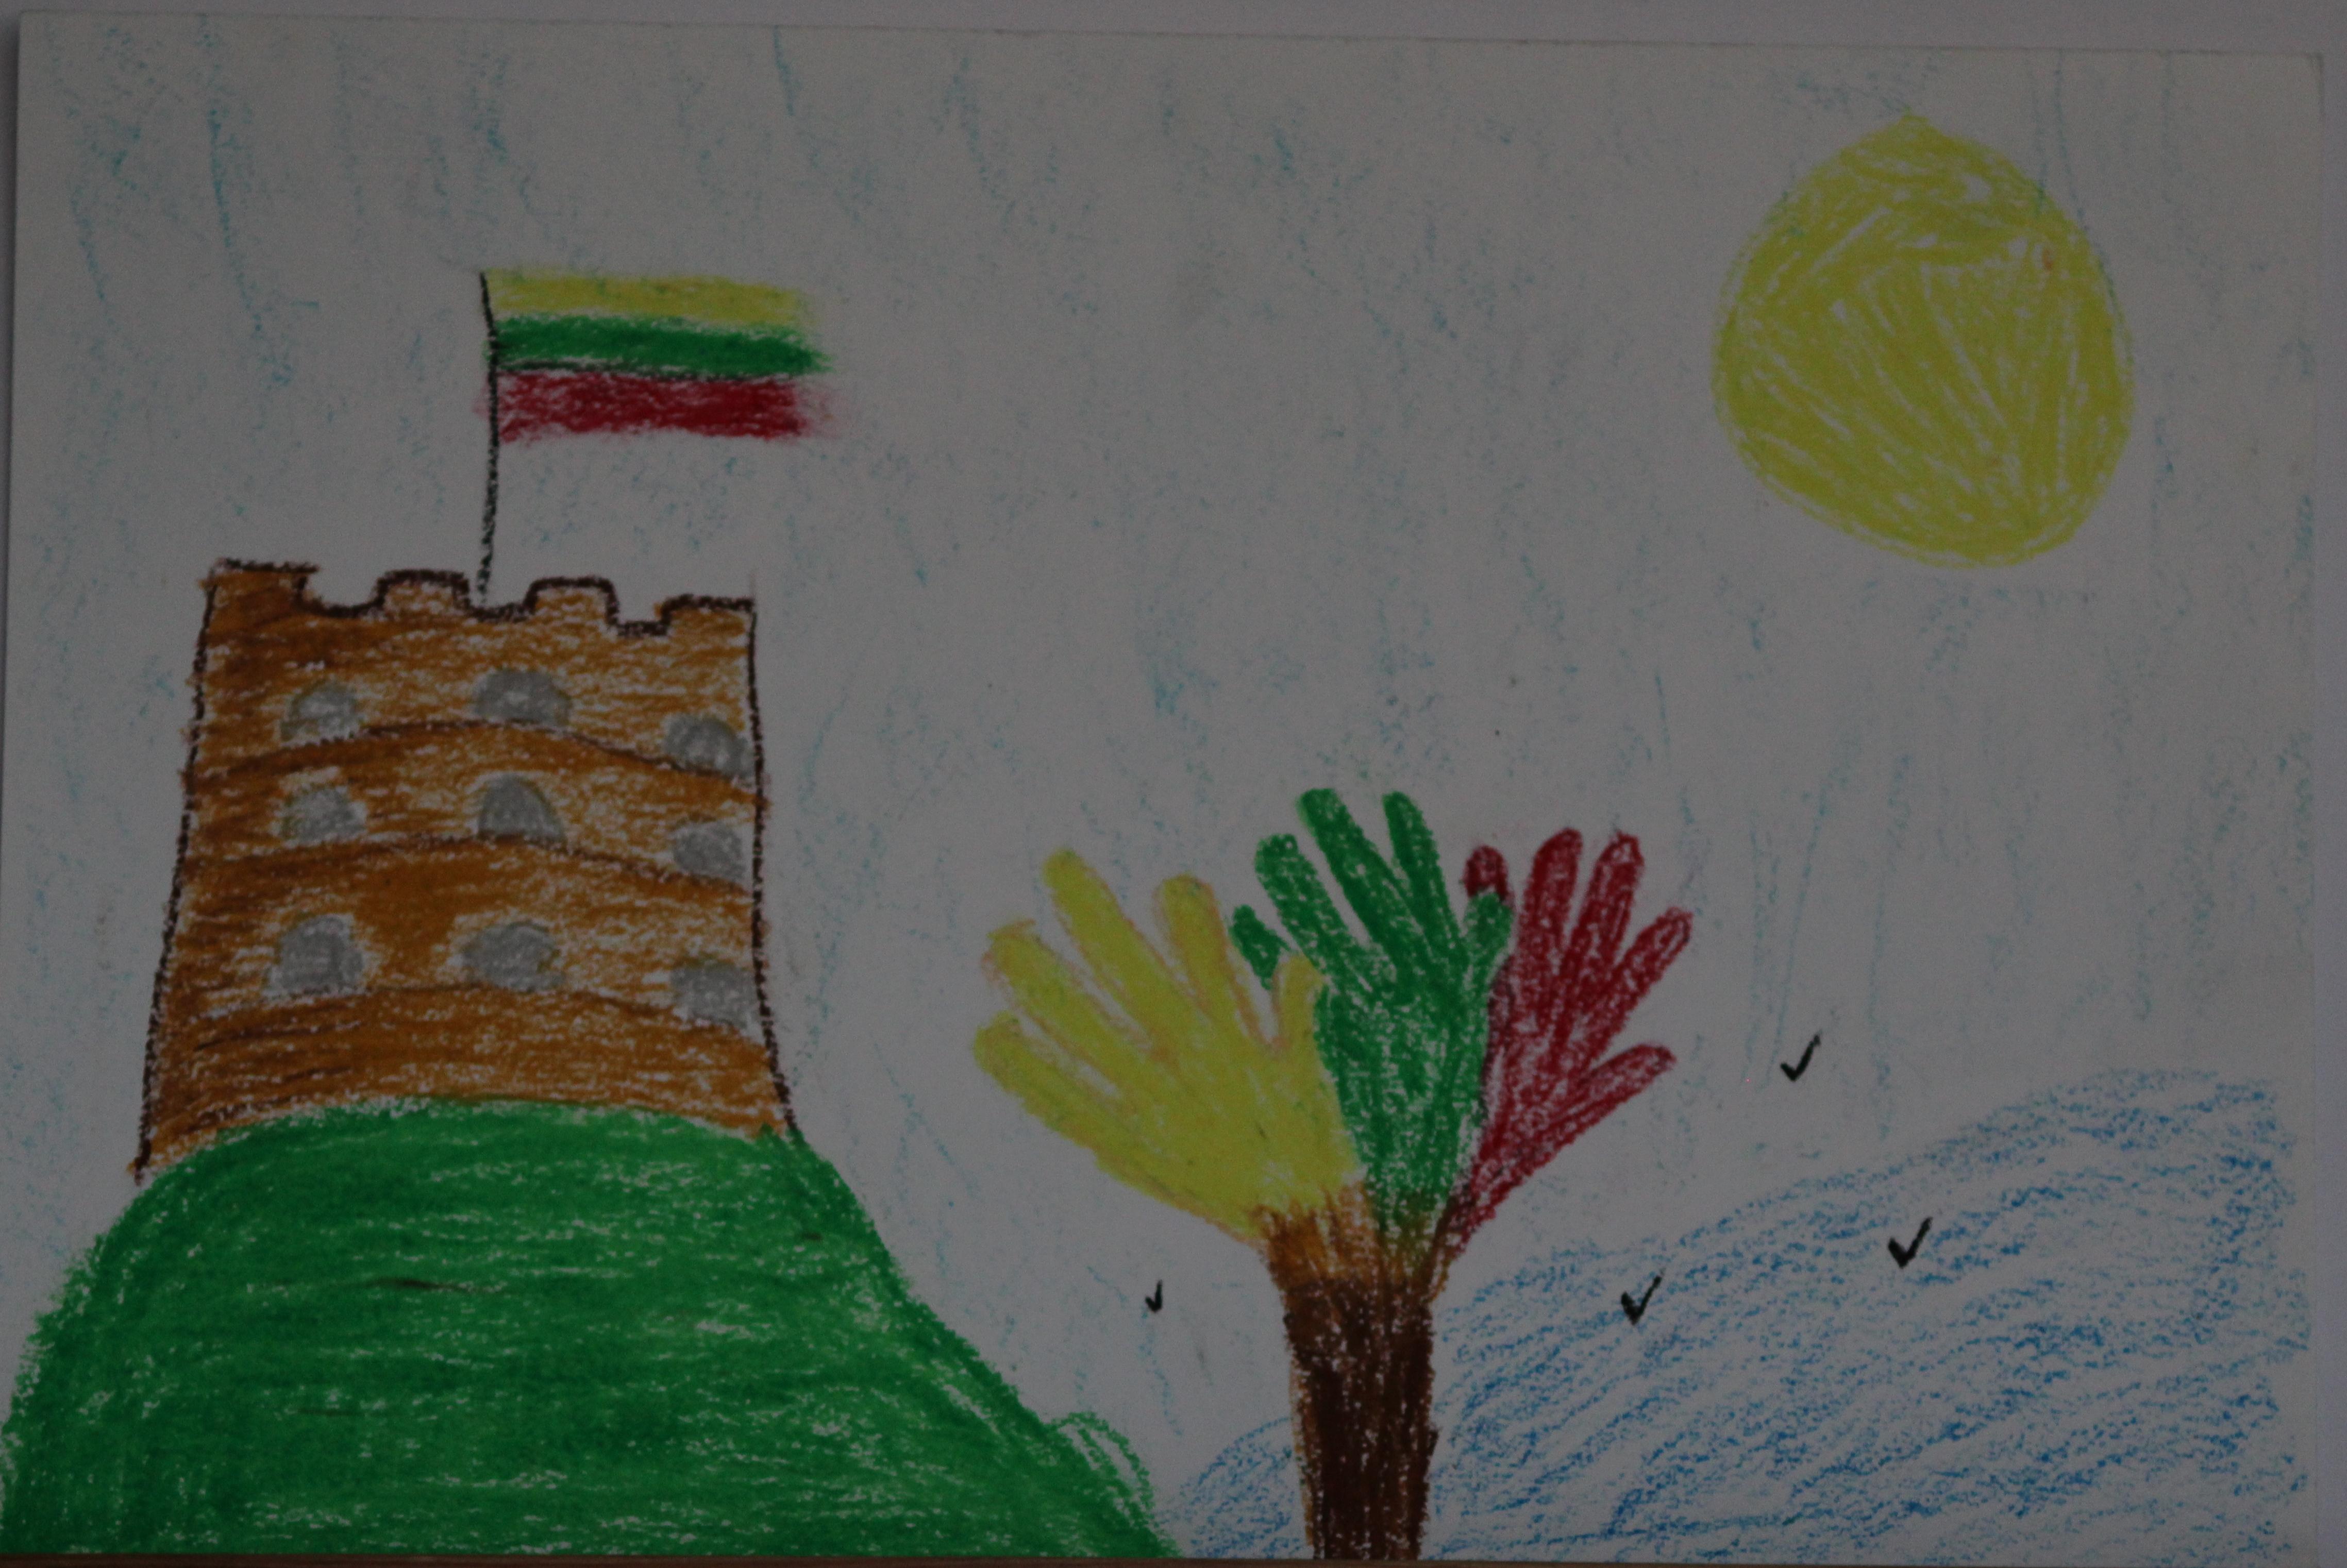 Jaroslava Ivanka Beleckaja - Rajenkova, 7 metai, Klaipėda